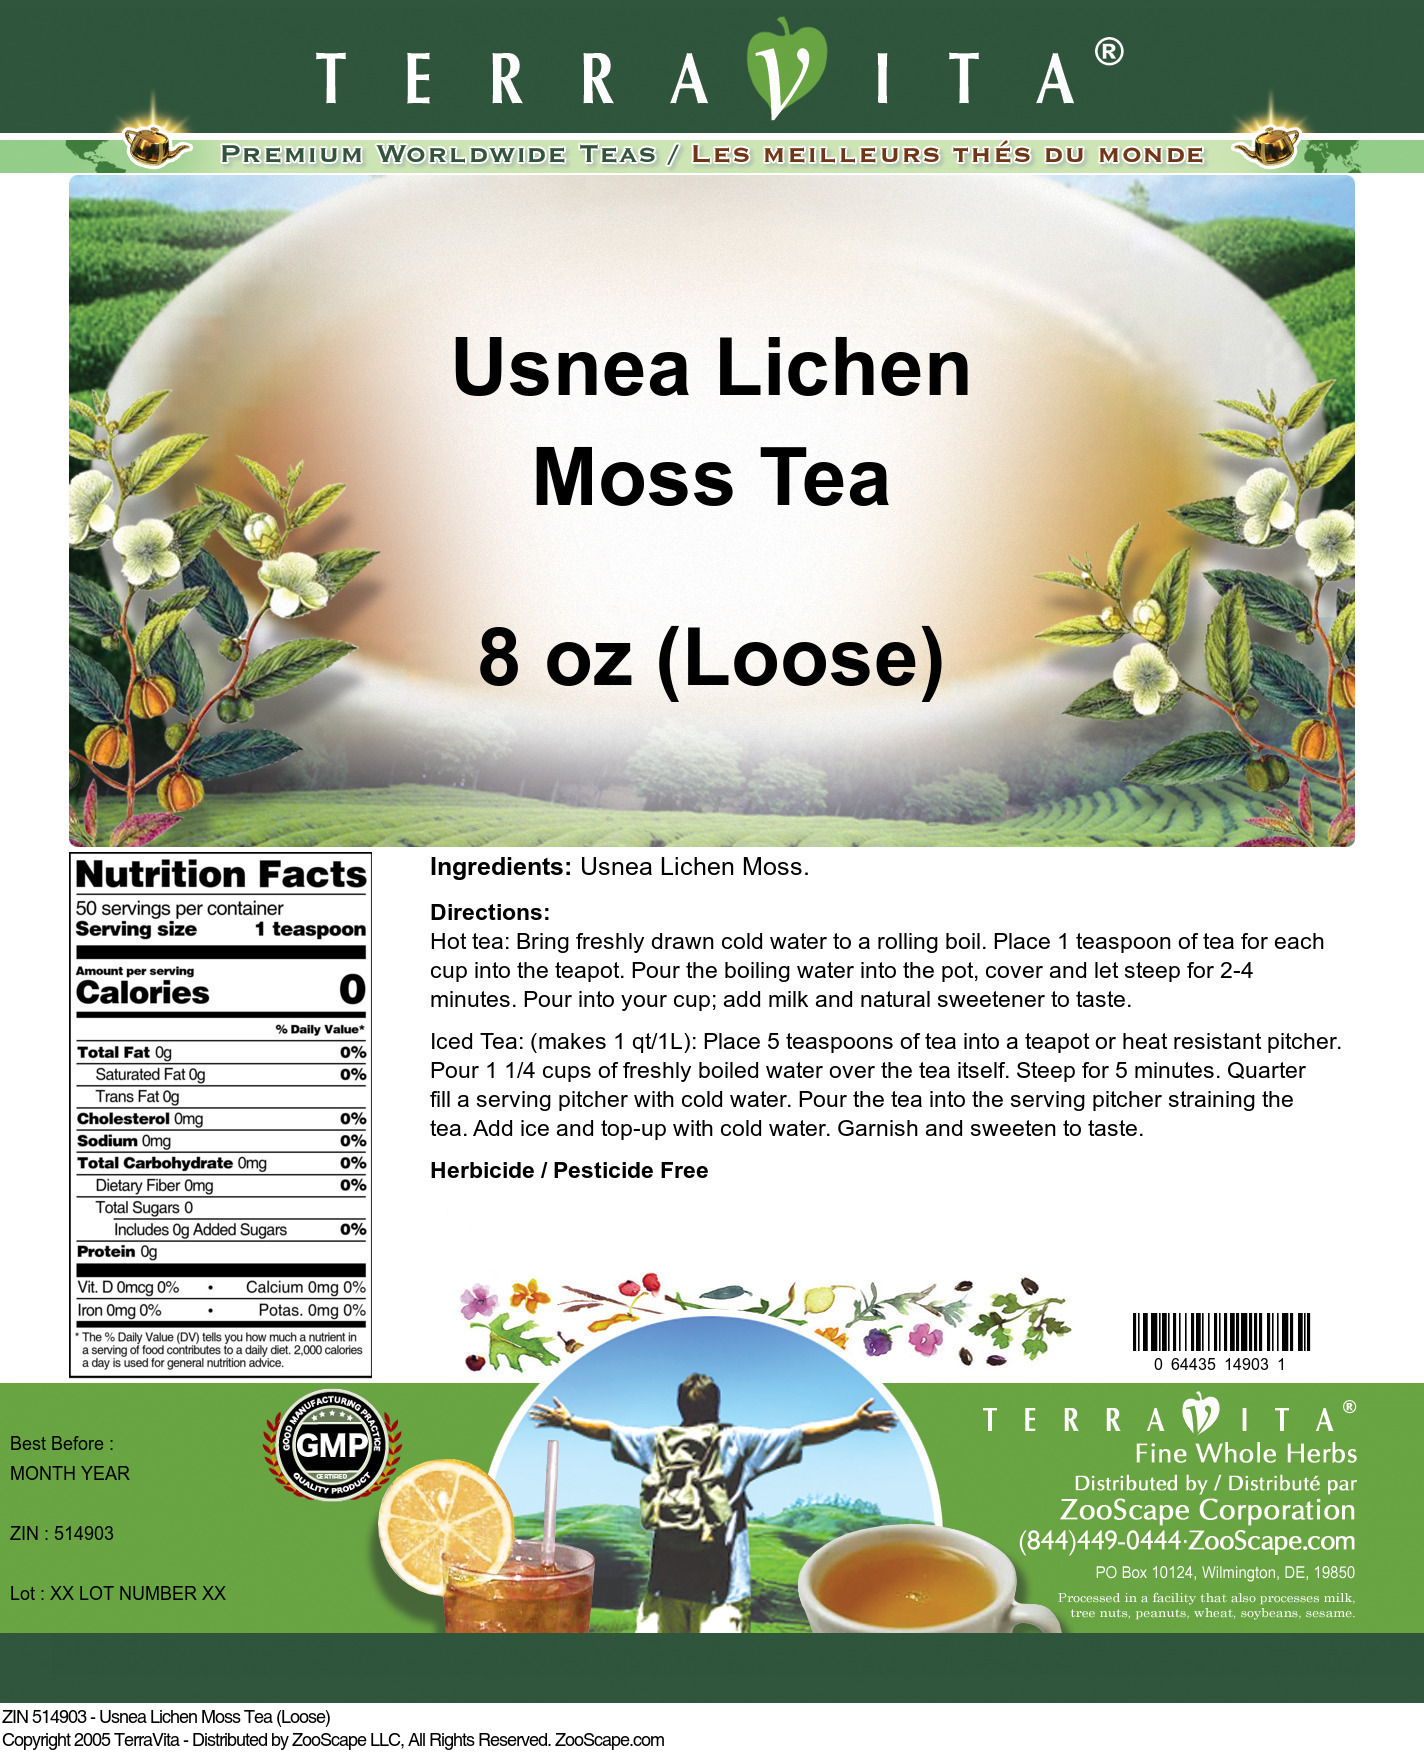 Usnea Lichen Moss Tea (Loose)